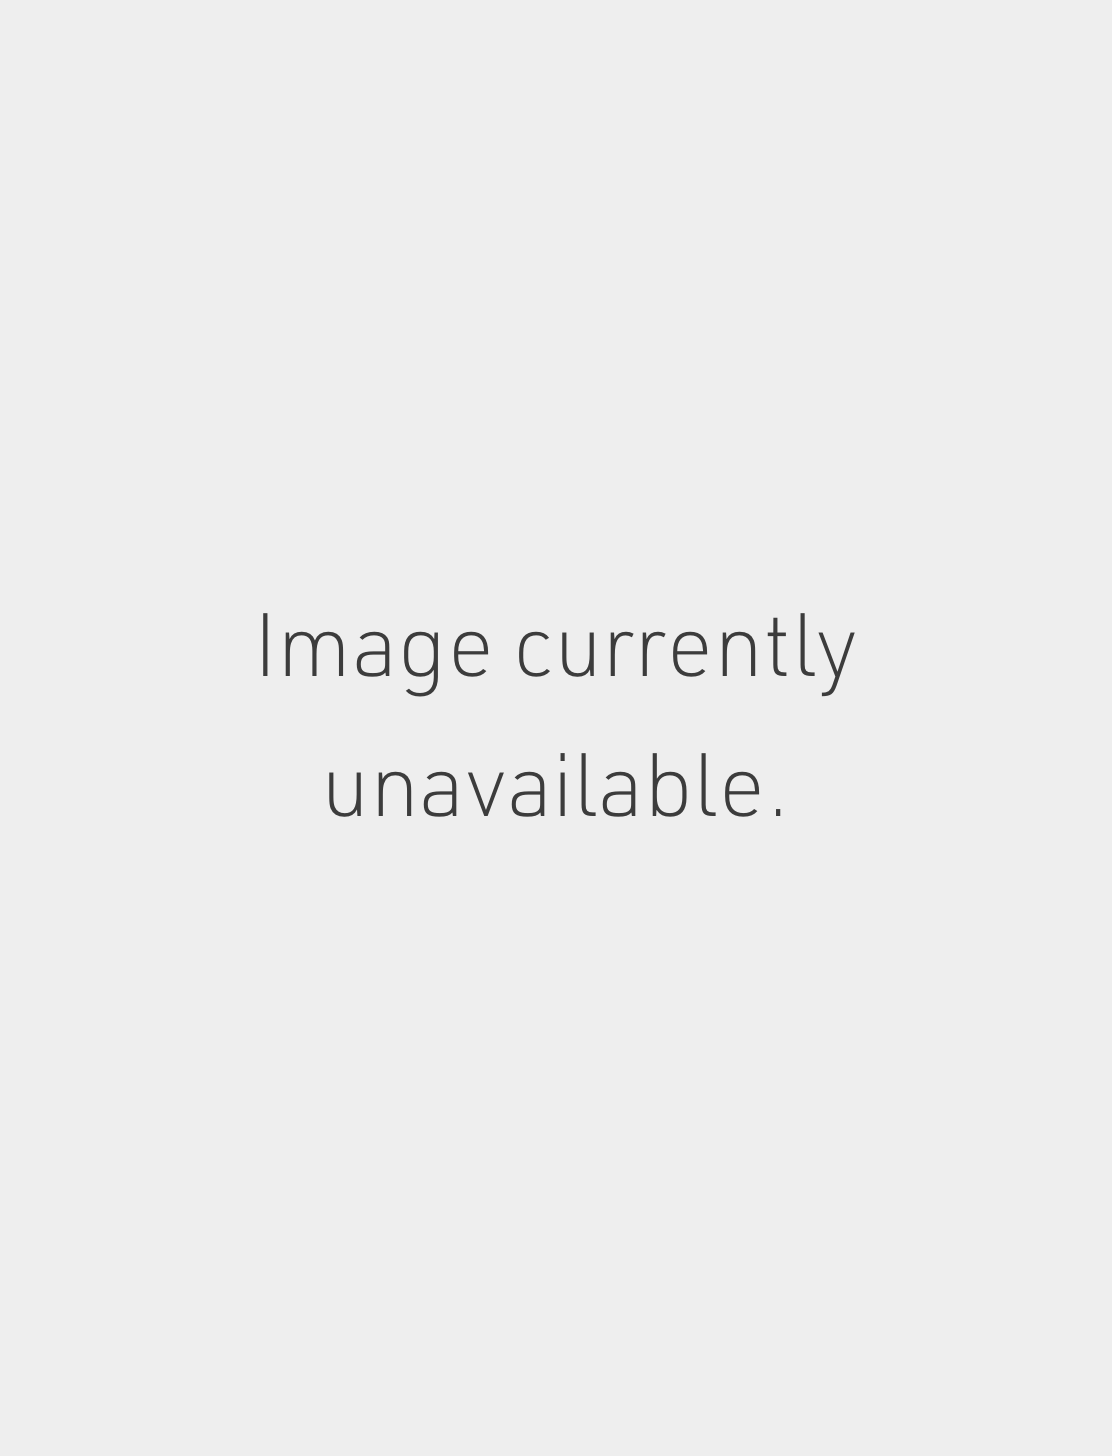 8mm 3 Black Opal Spike Granulated Clicker WHITE GOLD Image #model